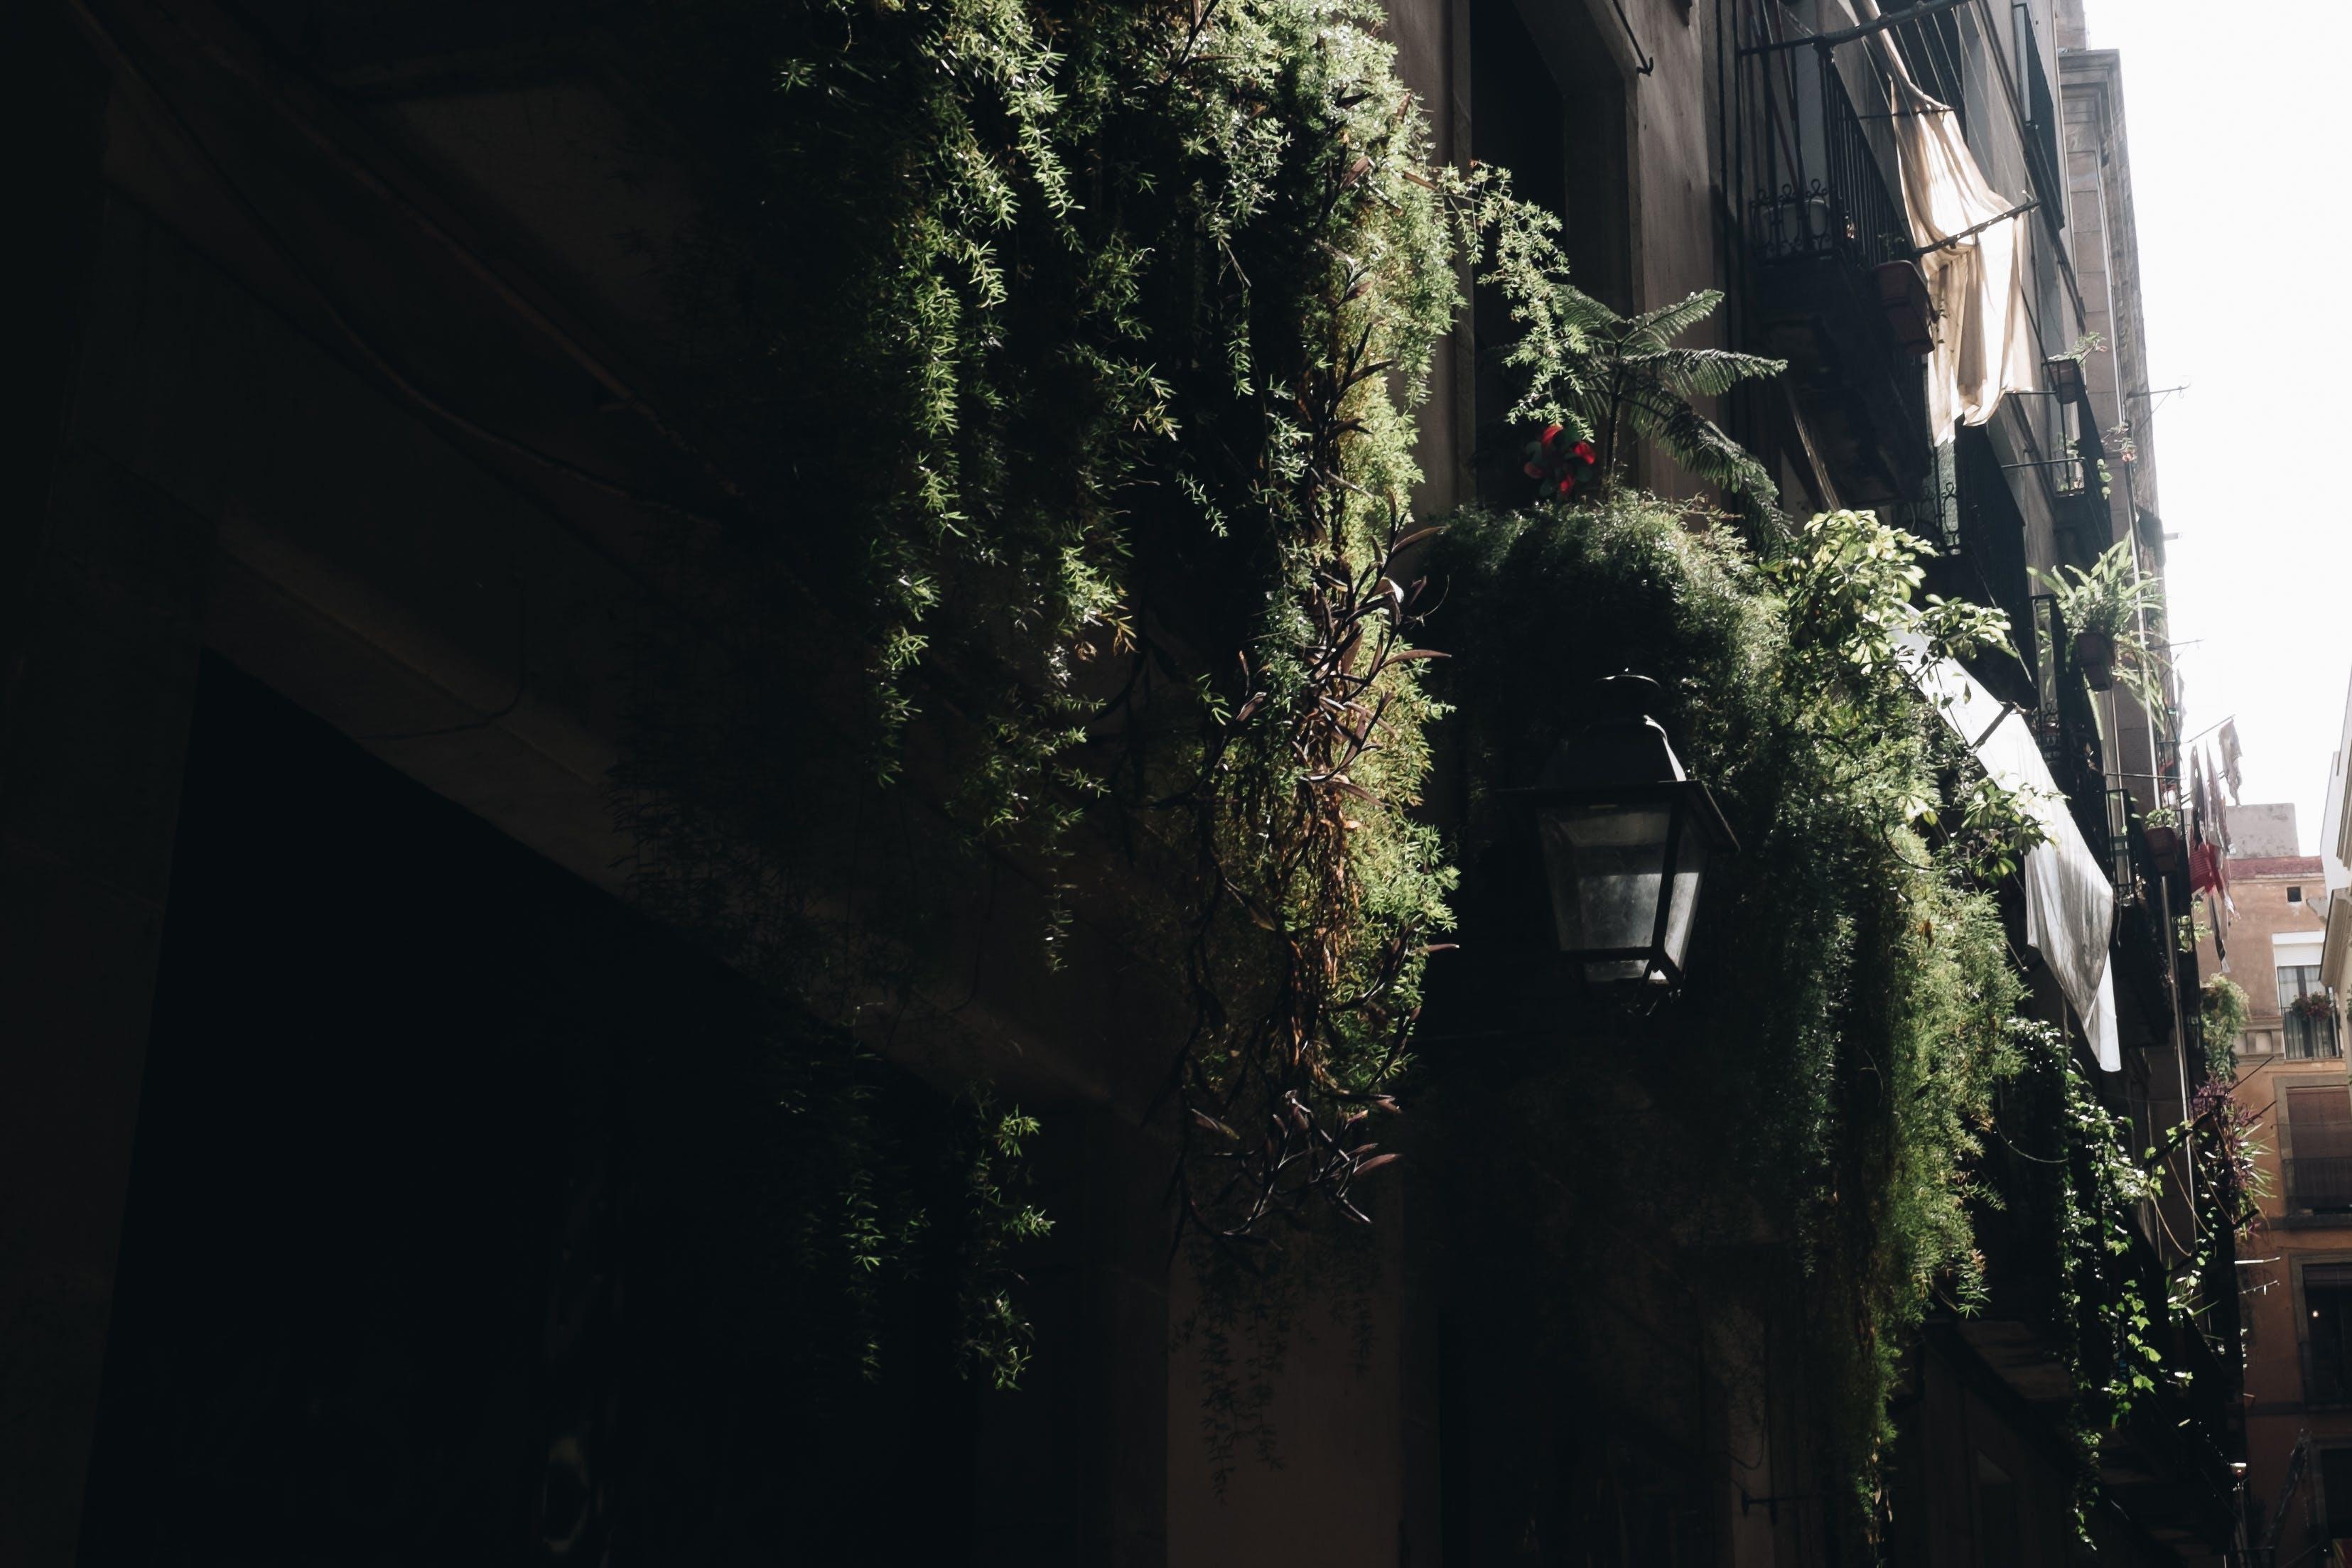 Concrete Building Surrounded by Potted Vine Plants